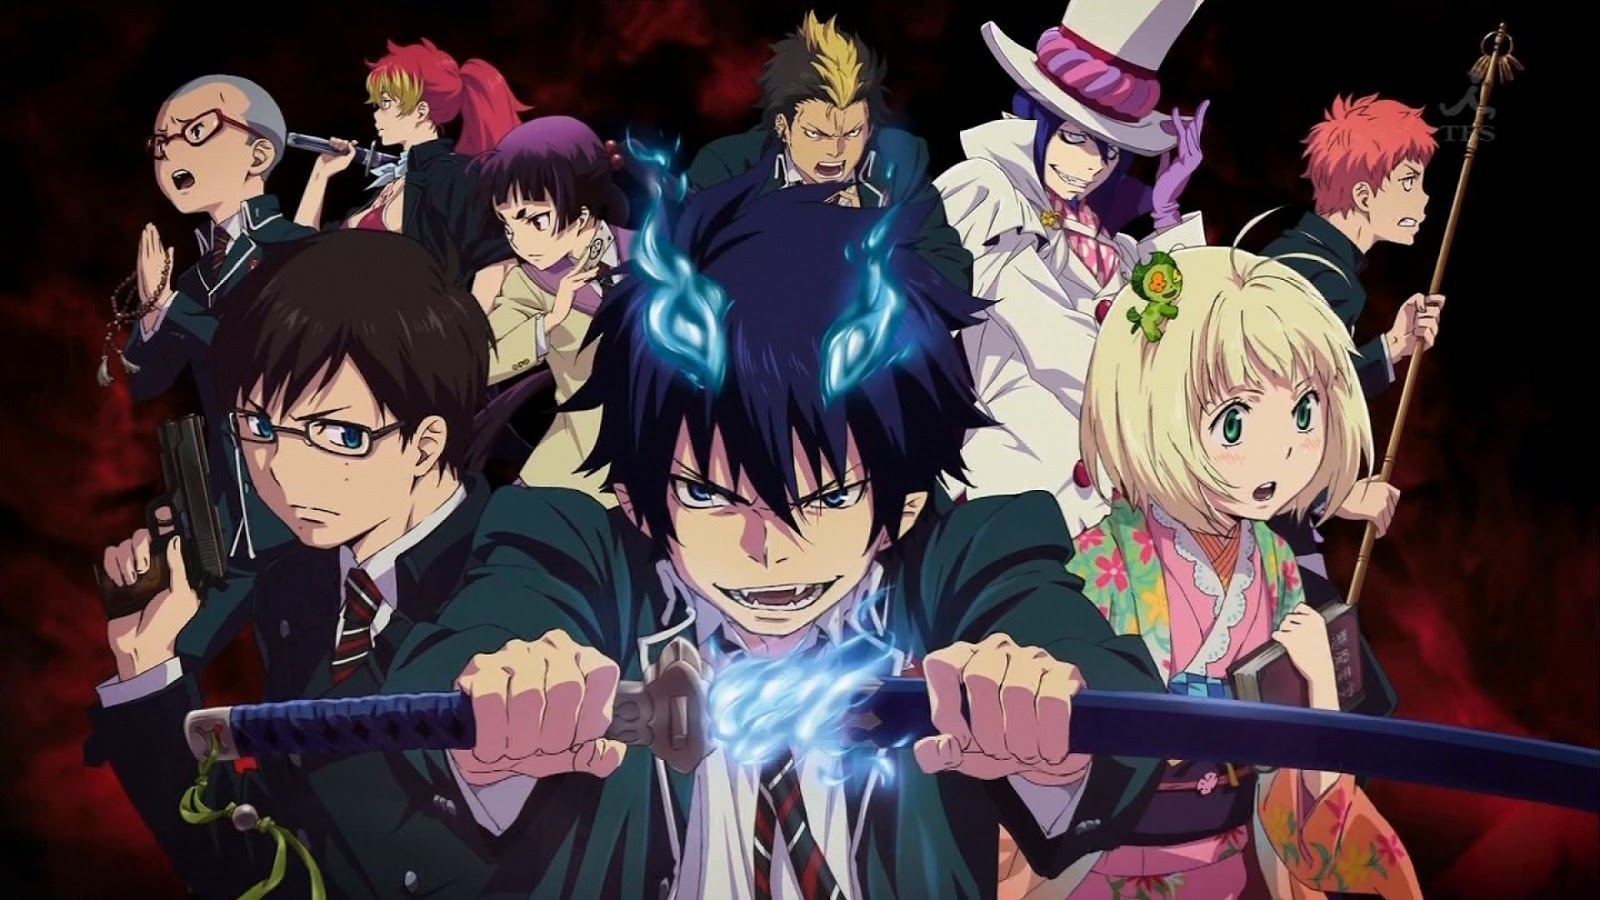 http://3.bp.blogspot.com/-SrUkzH-pQvs/UQnH7zZNspI/AAAAAAAAAdk/MHUgt9GxCRs/s1600/guns_anime_anime_boys_ao_no_exorcist_rin_okumura_mephisto_pheles_yukio_okumura_shura_kirigakure_shie_High-Resolution-Wallpaper_1920x1080_www_wallpaperfo_com_.jpg